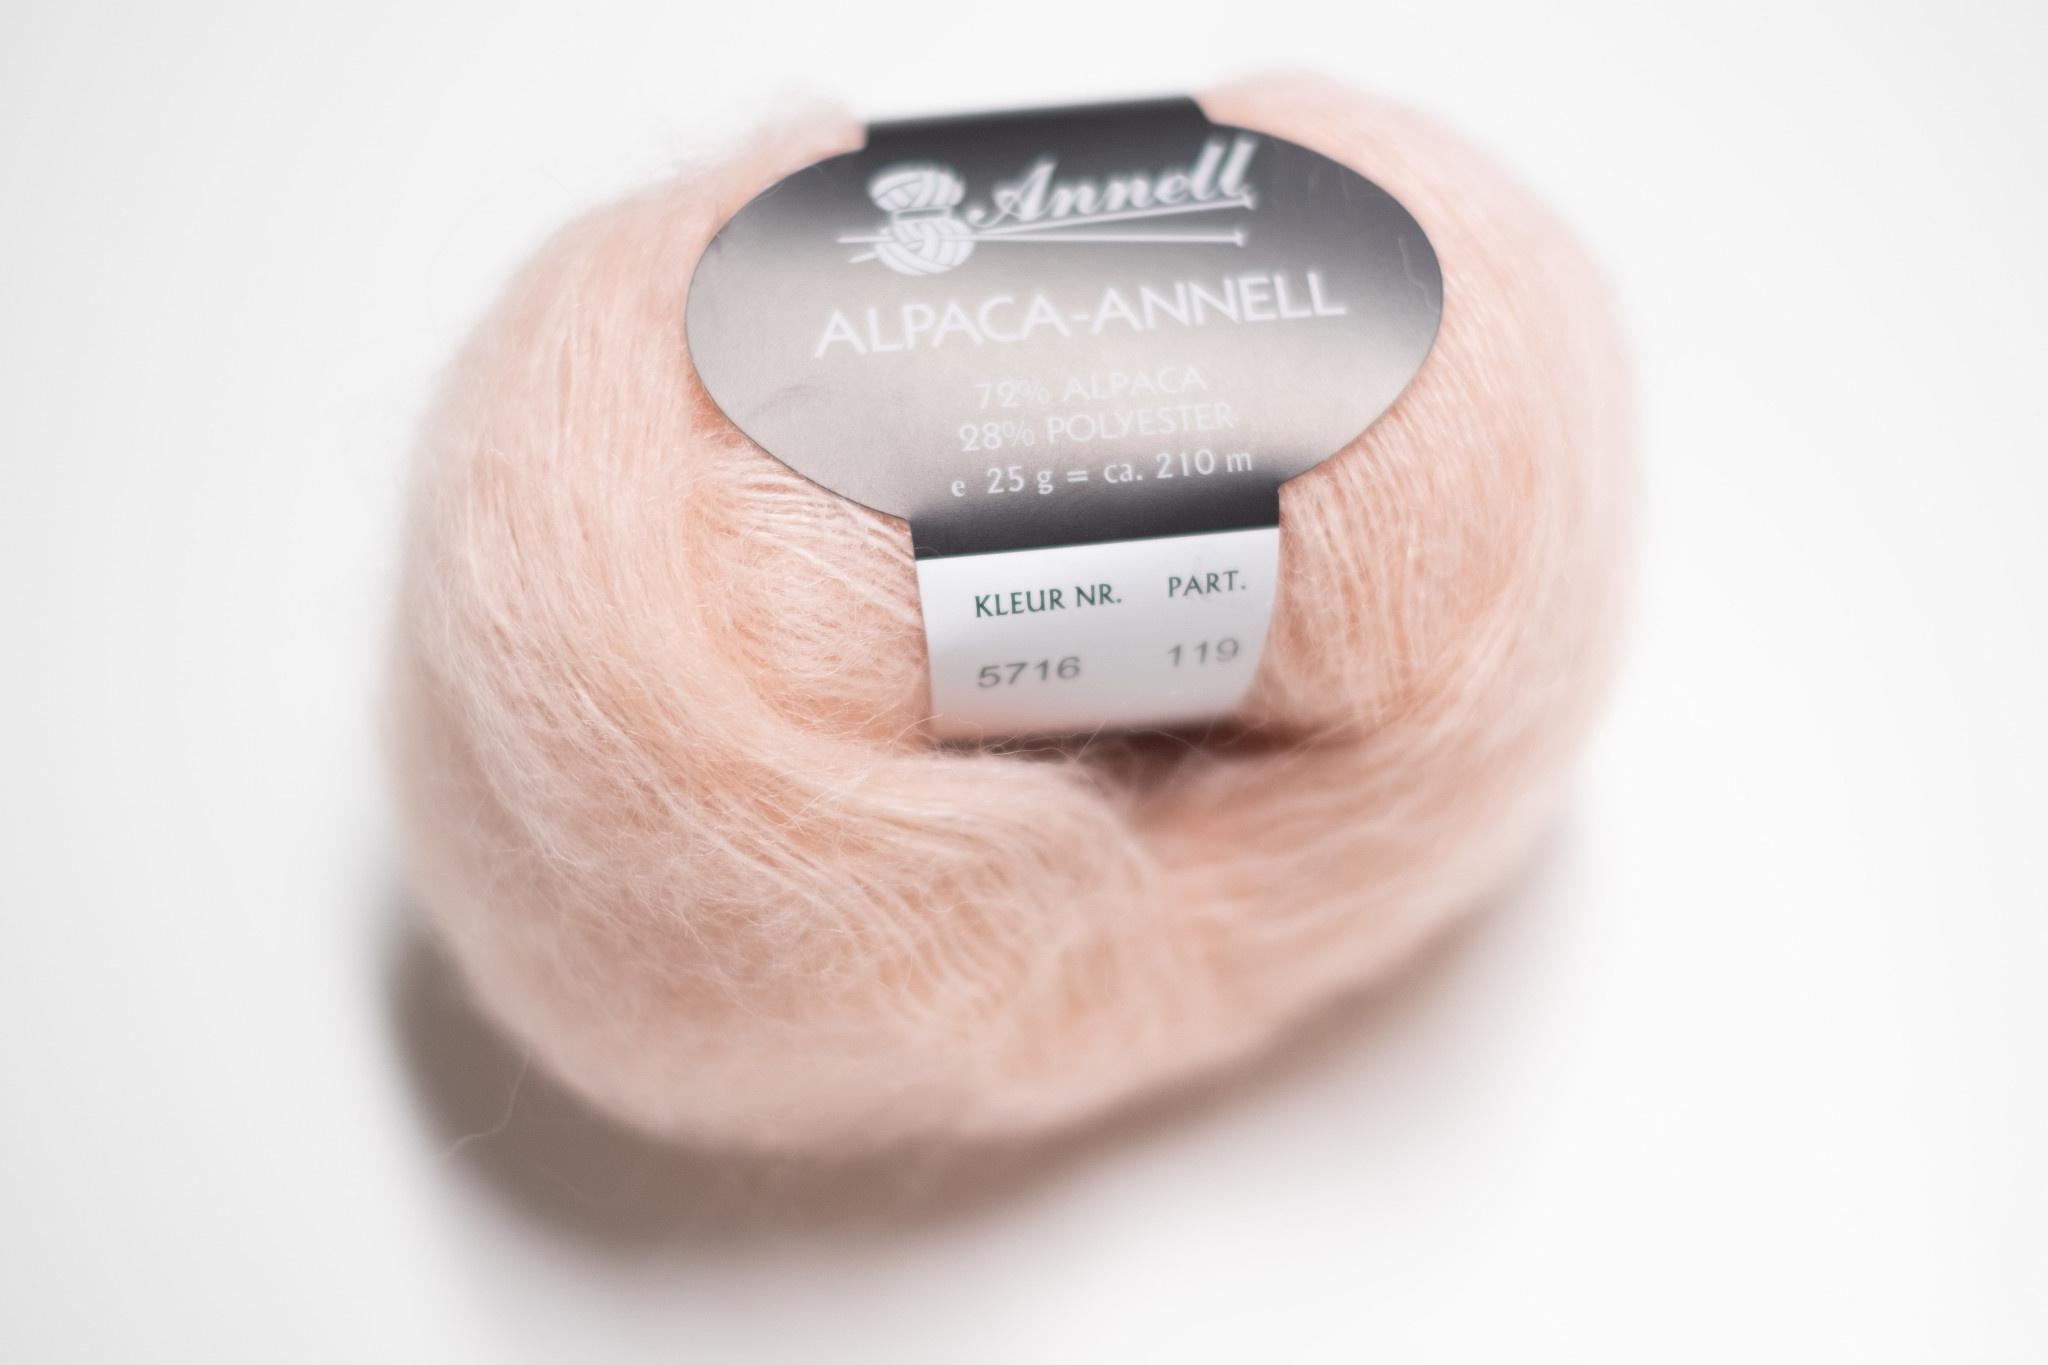 Annell Alpaca-Annell - kleur 5716